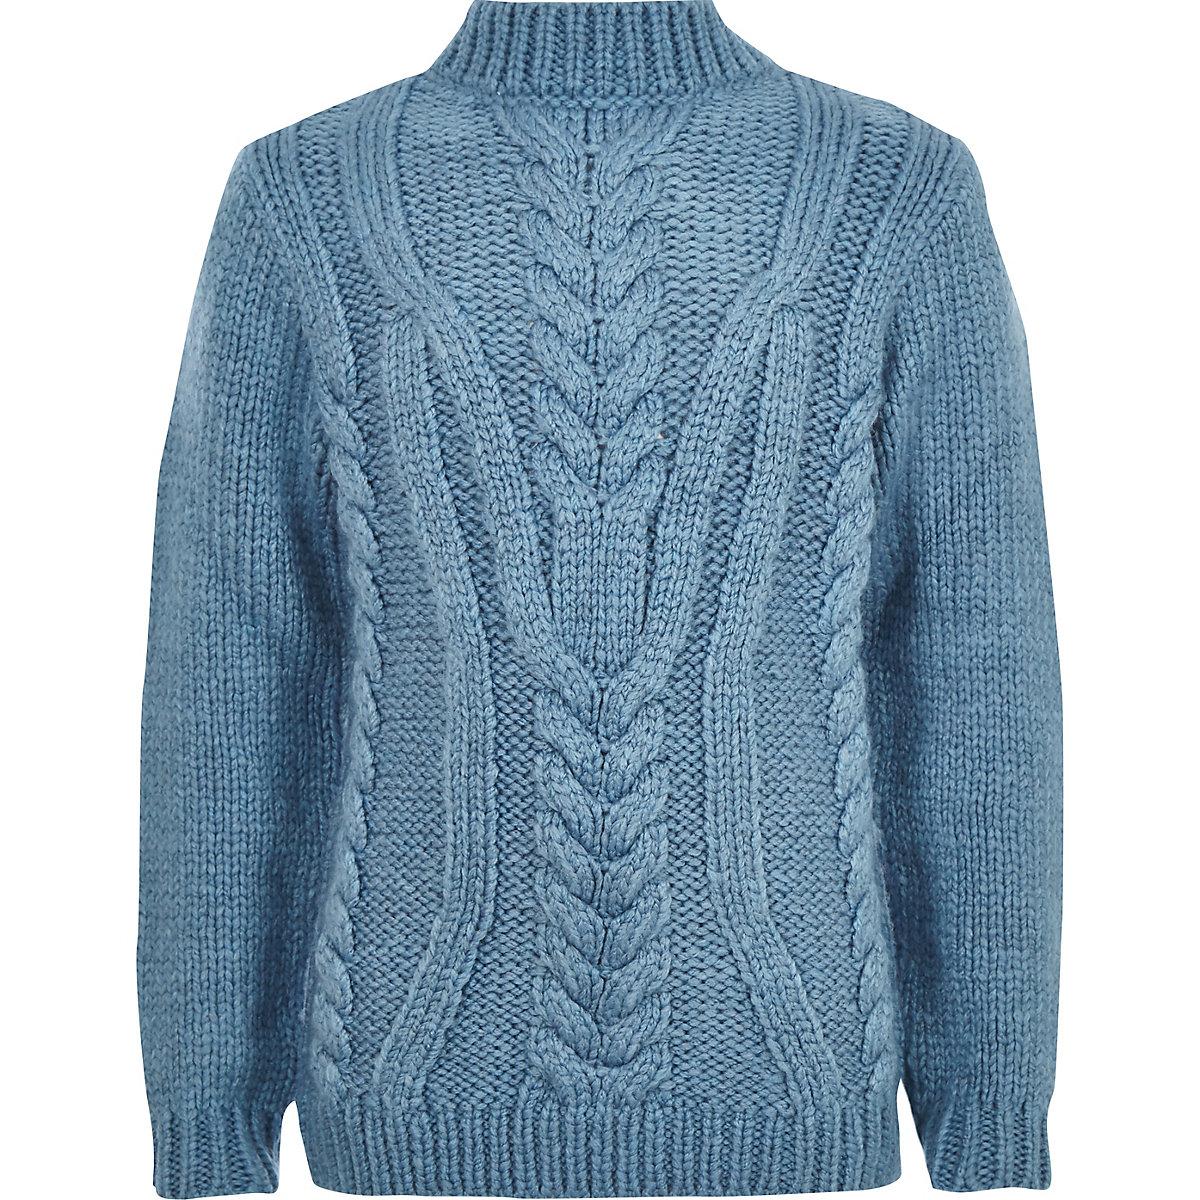 Boys blue turtle neck cable knit jumper